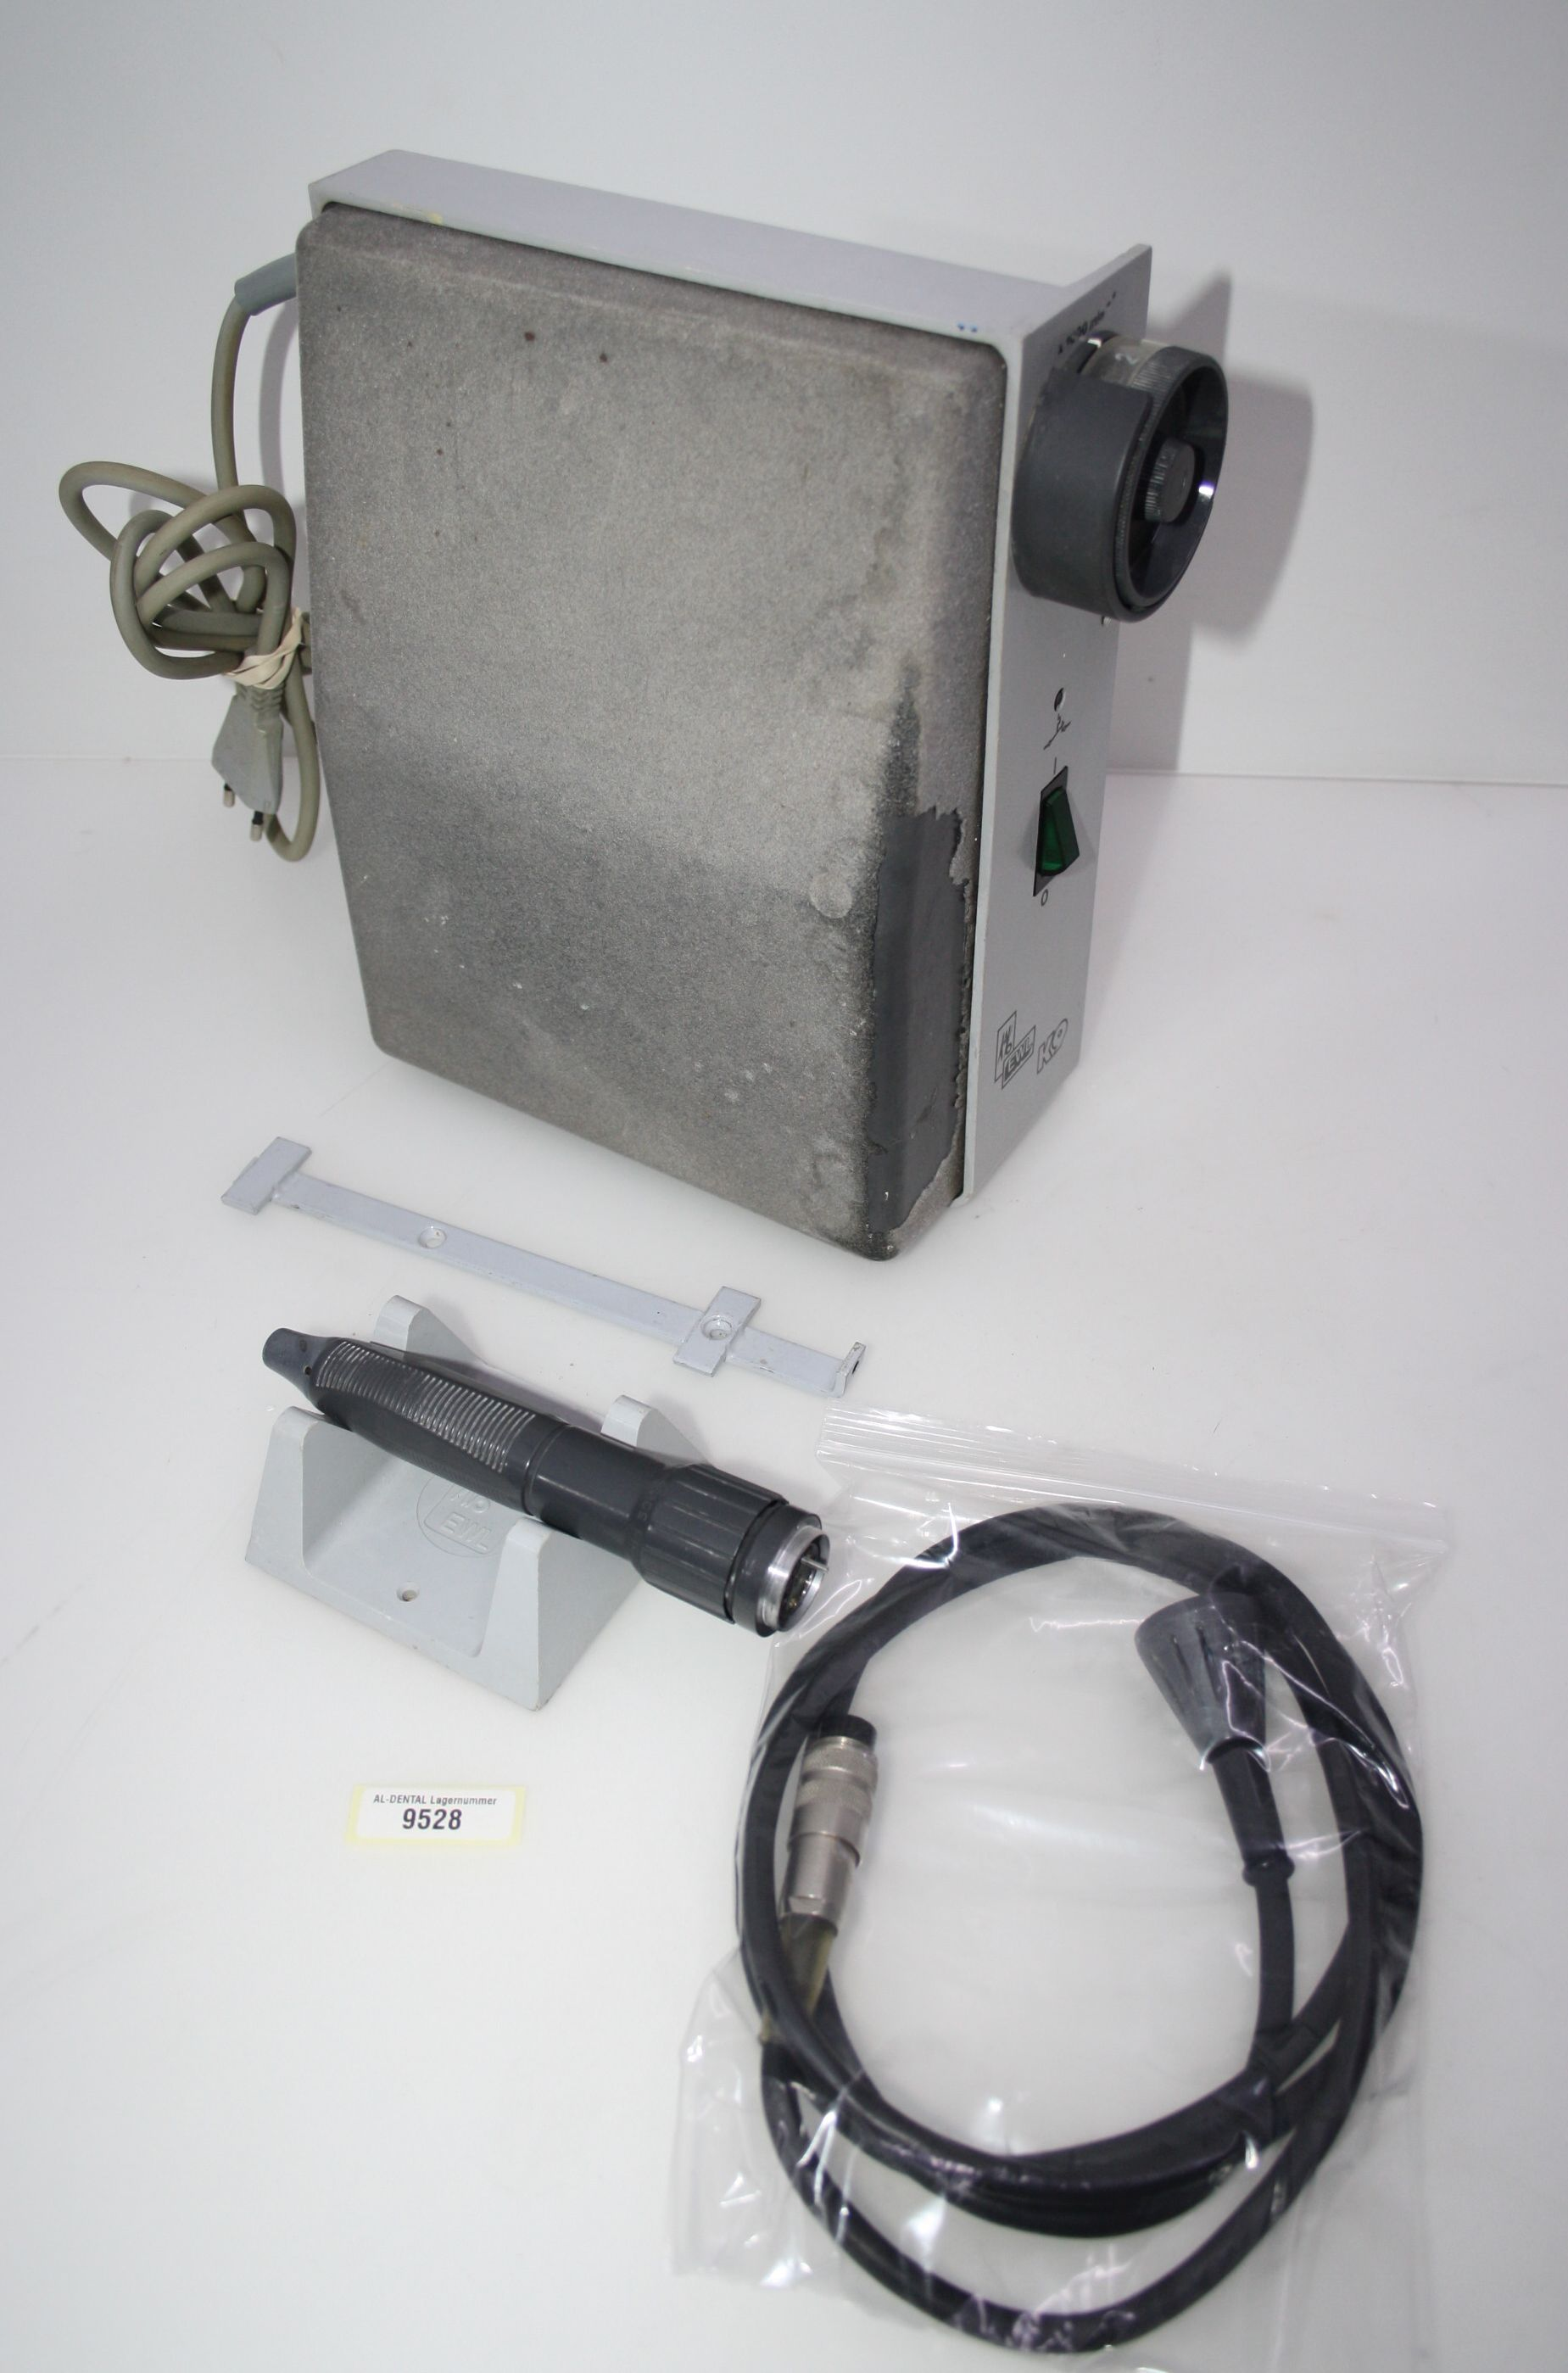 KaVo K 9 Anlage komplett / Technikmaschine # 9522